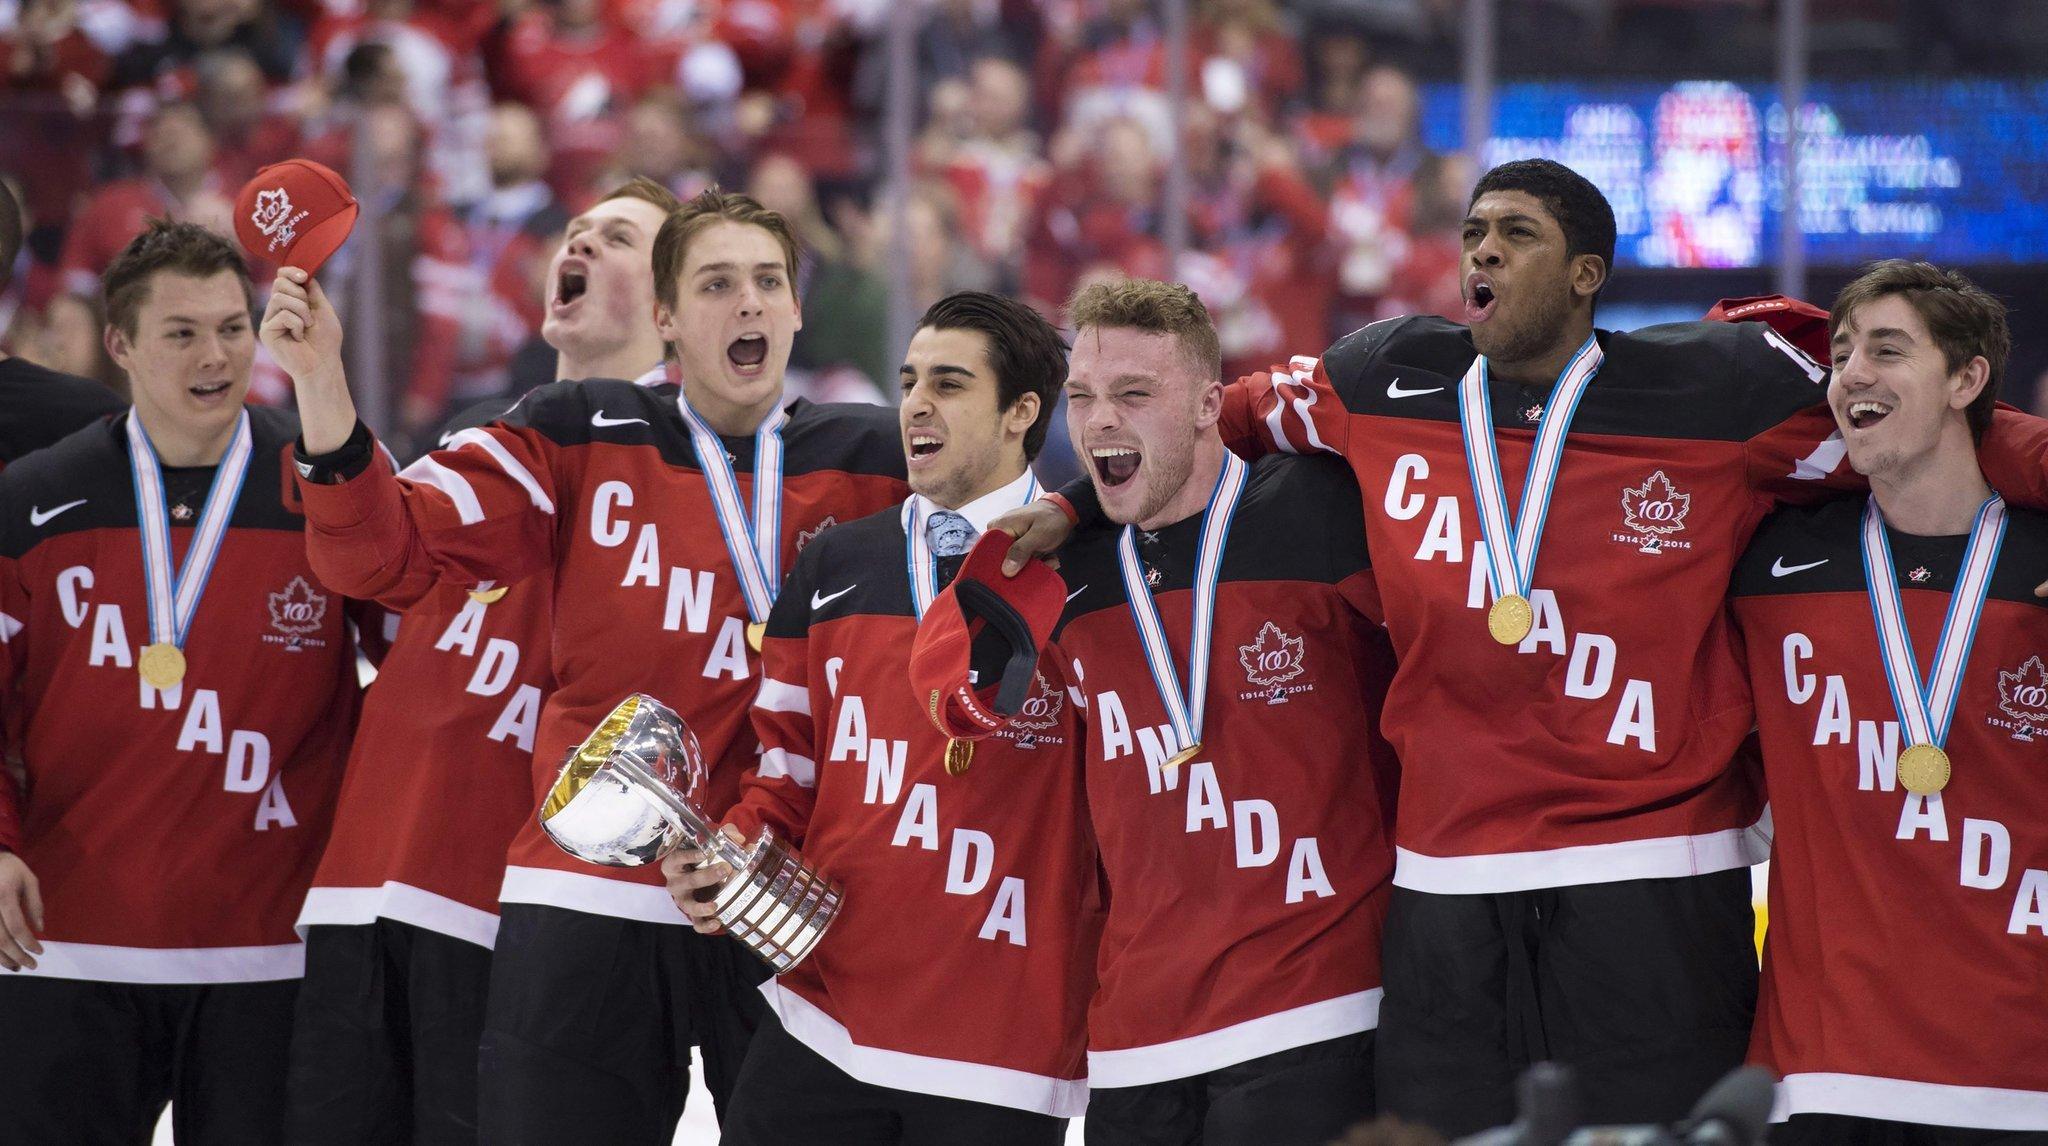 Canada beats Russia 5-4 for record 16th world junior title